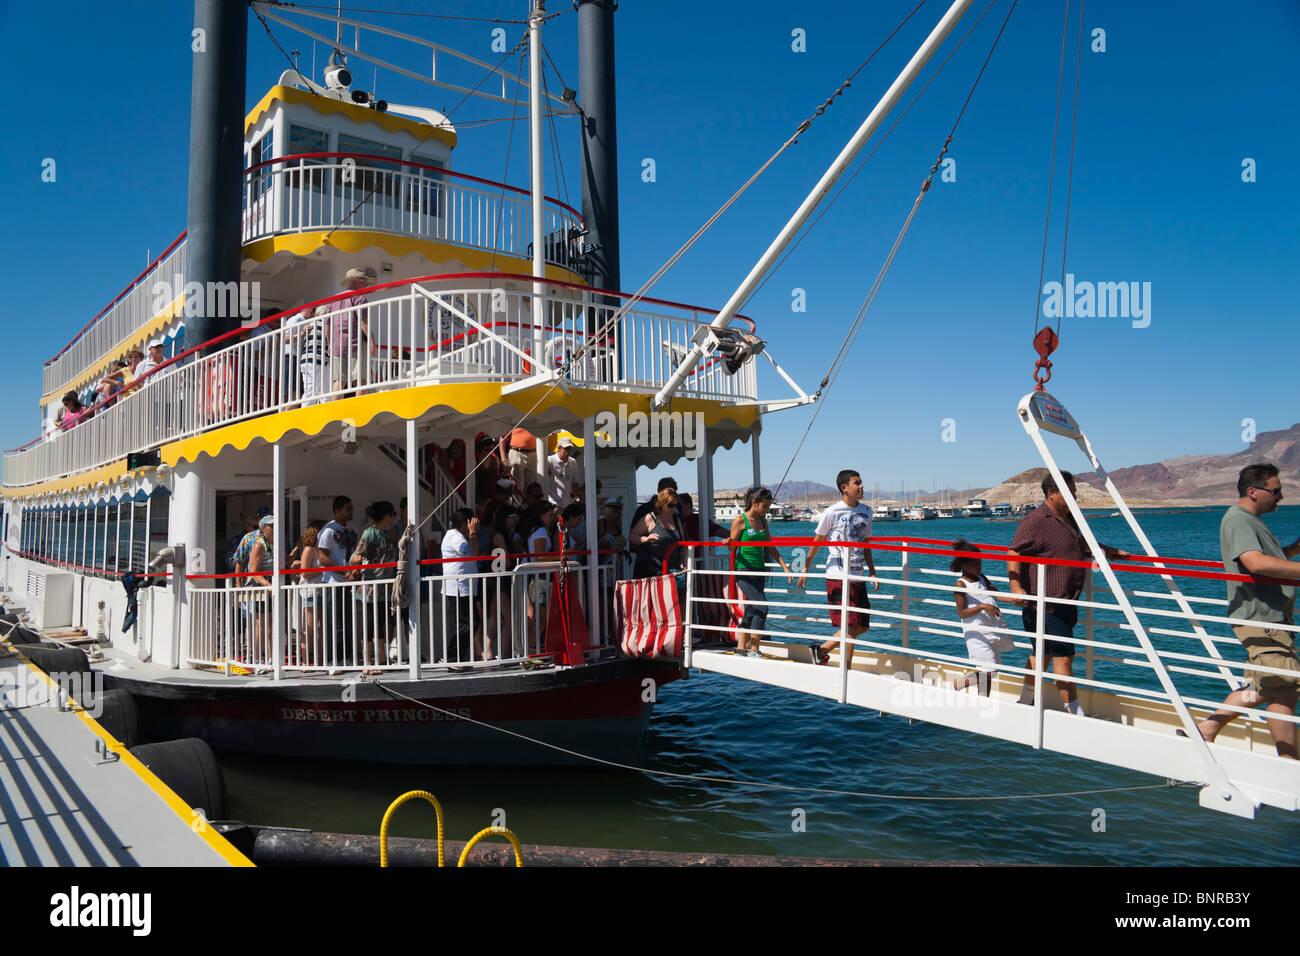 USA Nevada - Lake Mead excursion paddle boat Desert Princess, passengers disembarking. Stock Photo